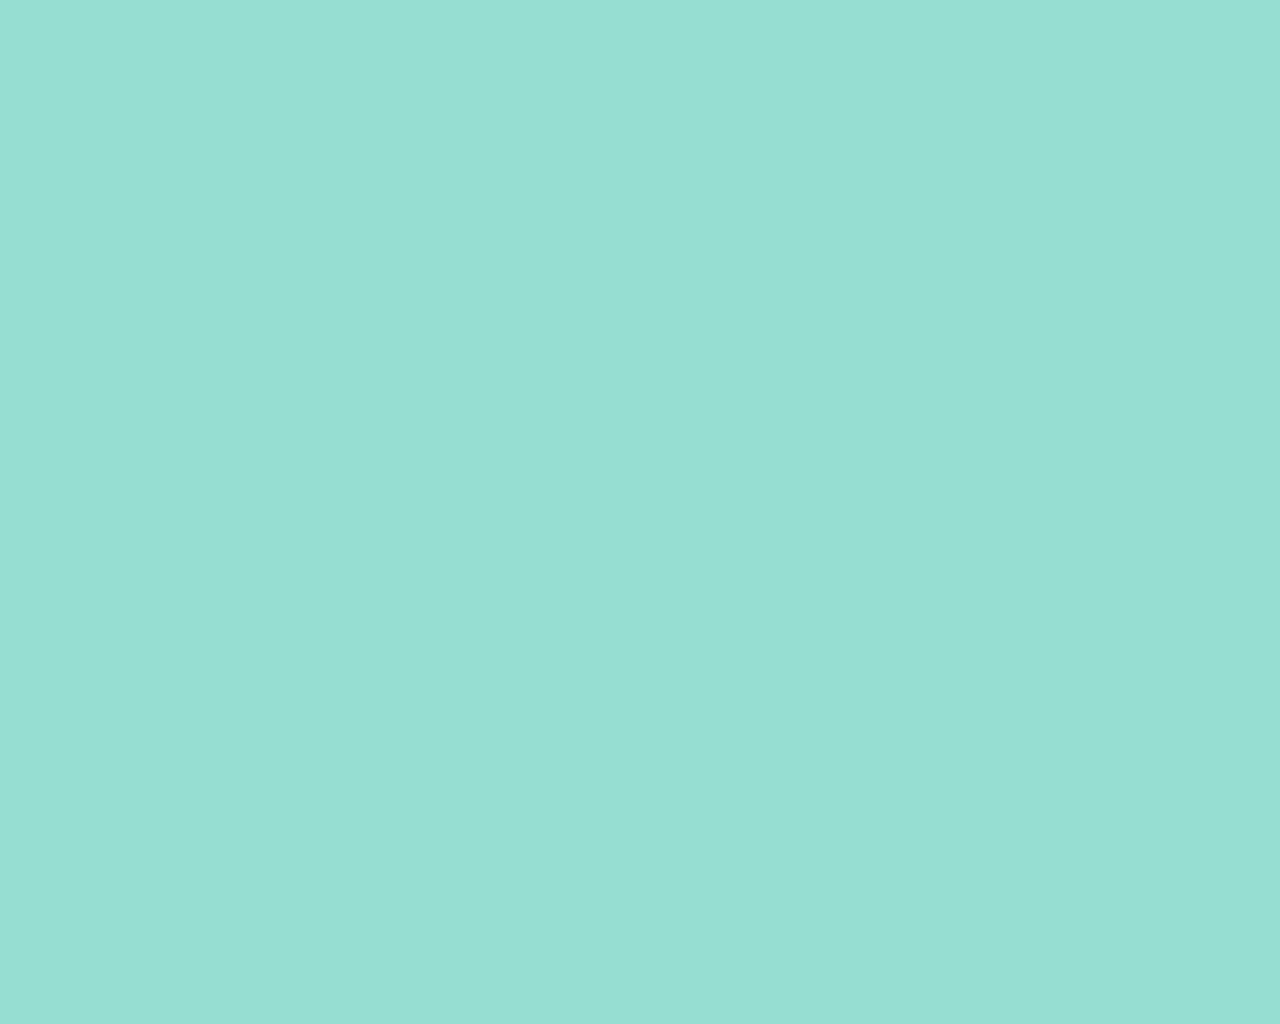 1280x1024 Pale Robin Egg Blue Solid Color Background